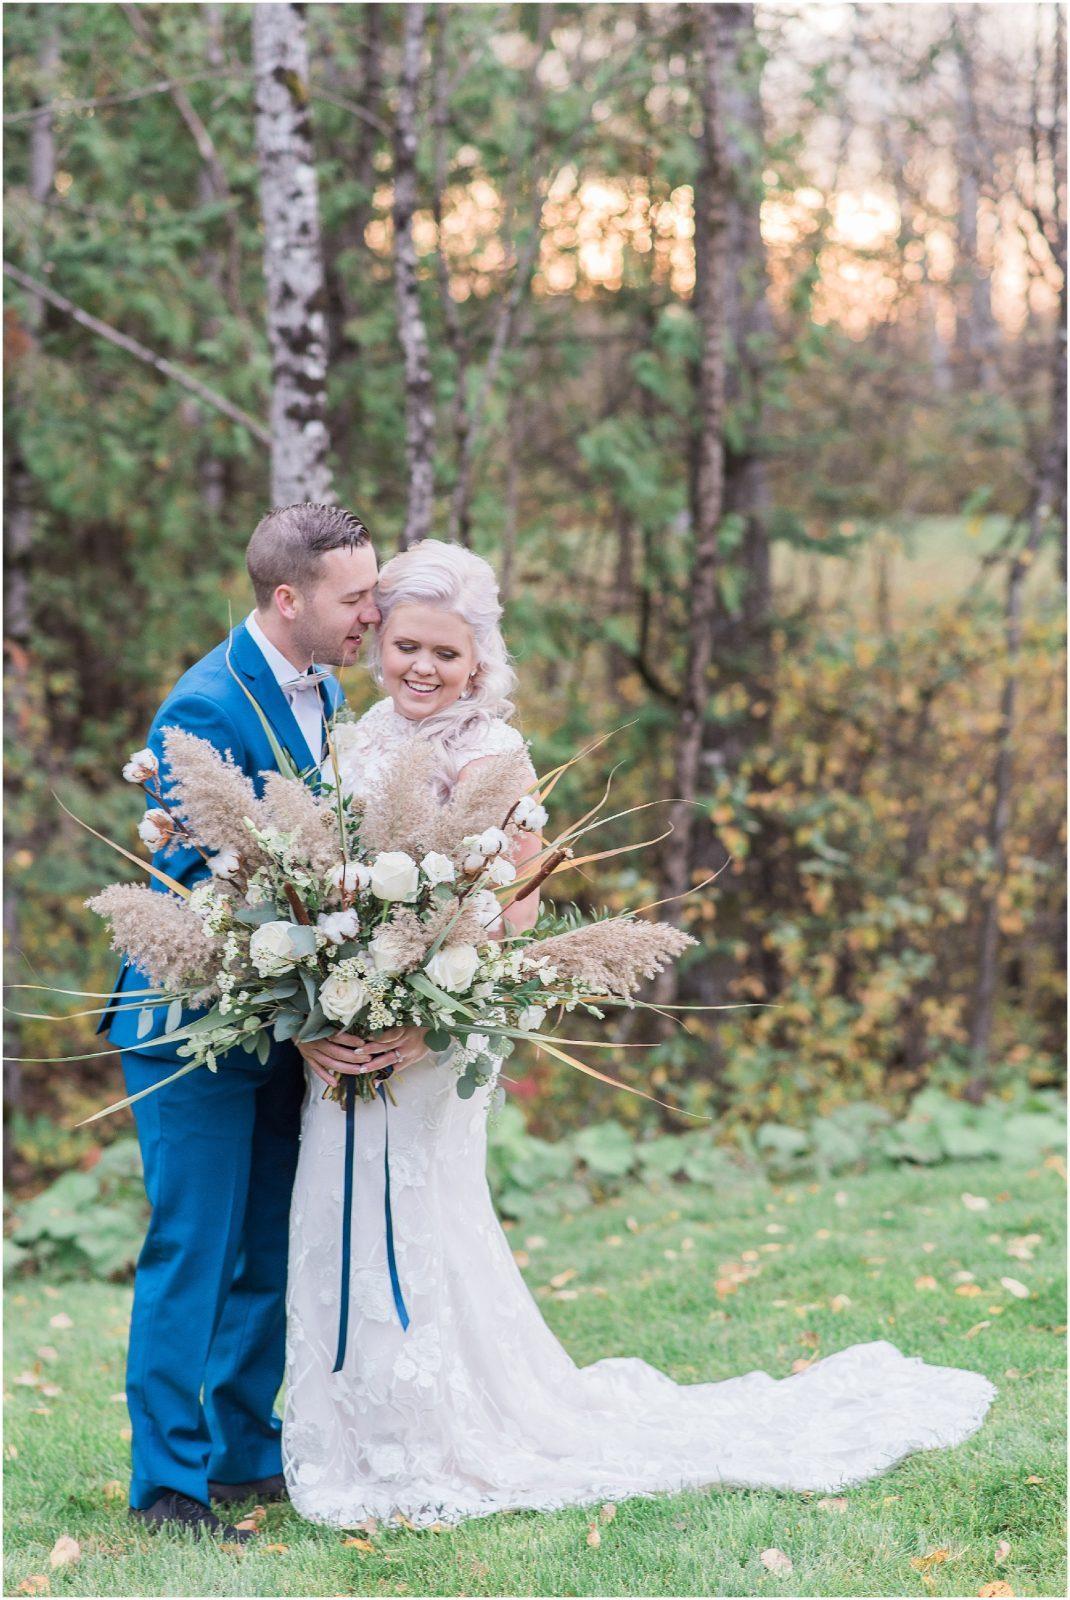 0043 Bethany and Luc - Fall Backyard Ottawa Wedding - Copper and Navy - PhotosbyEmmaH.jpg